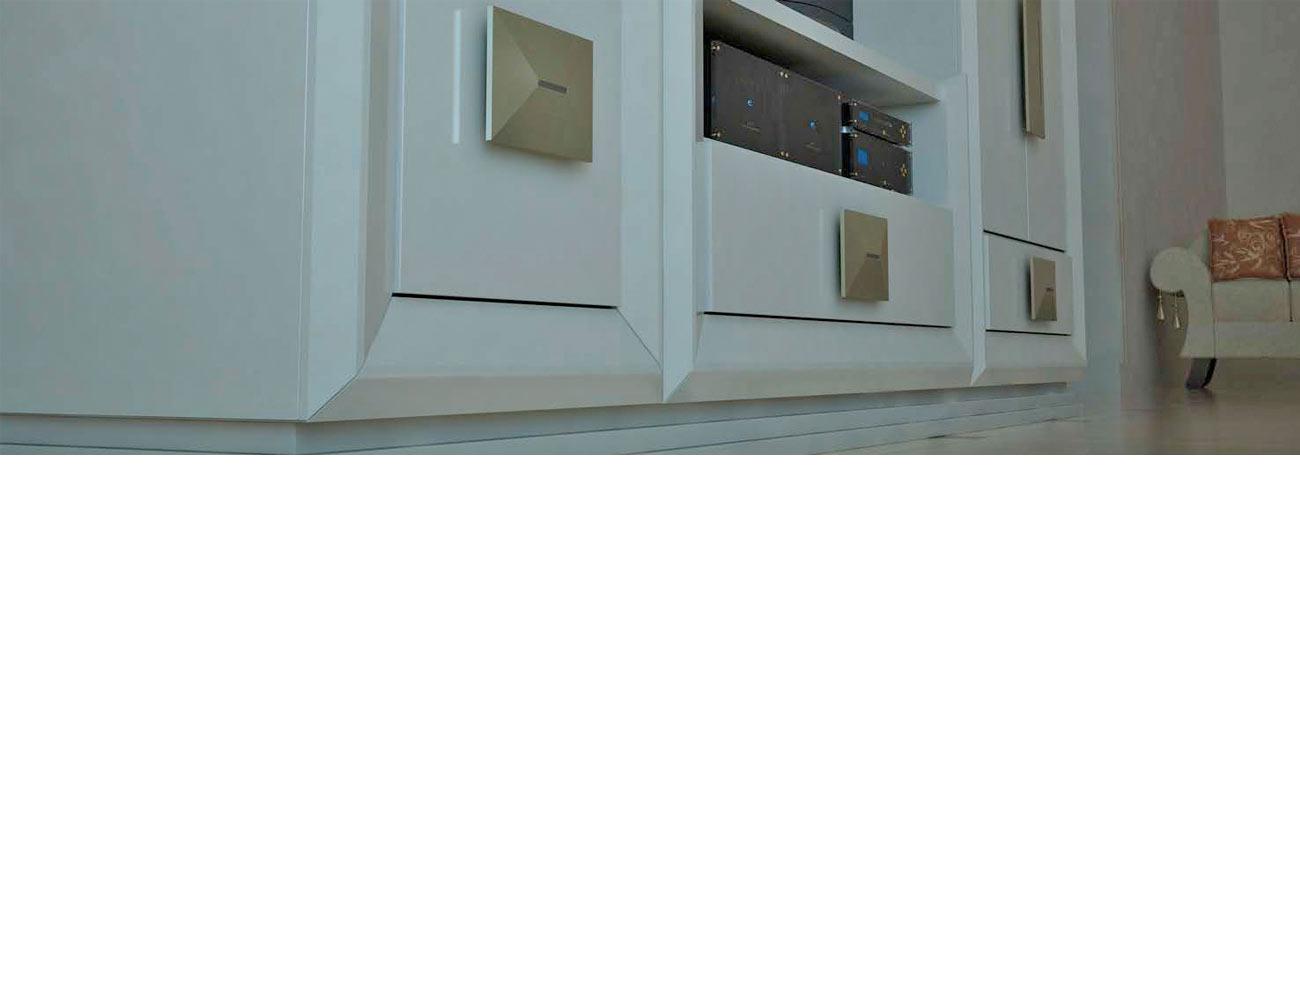 Detalle partes bajas mueble salon blanco